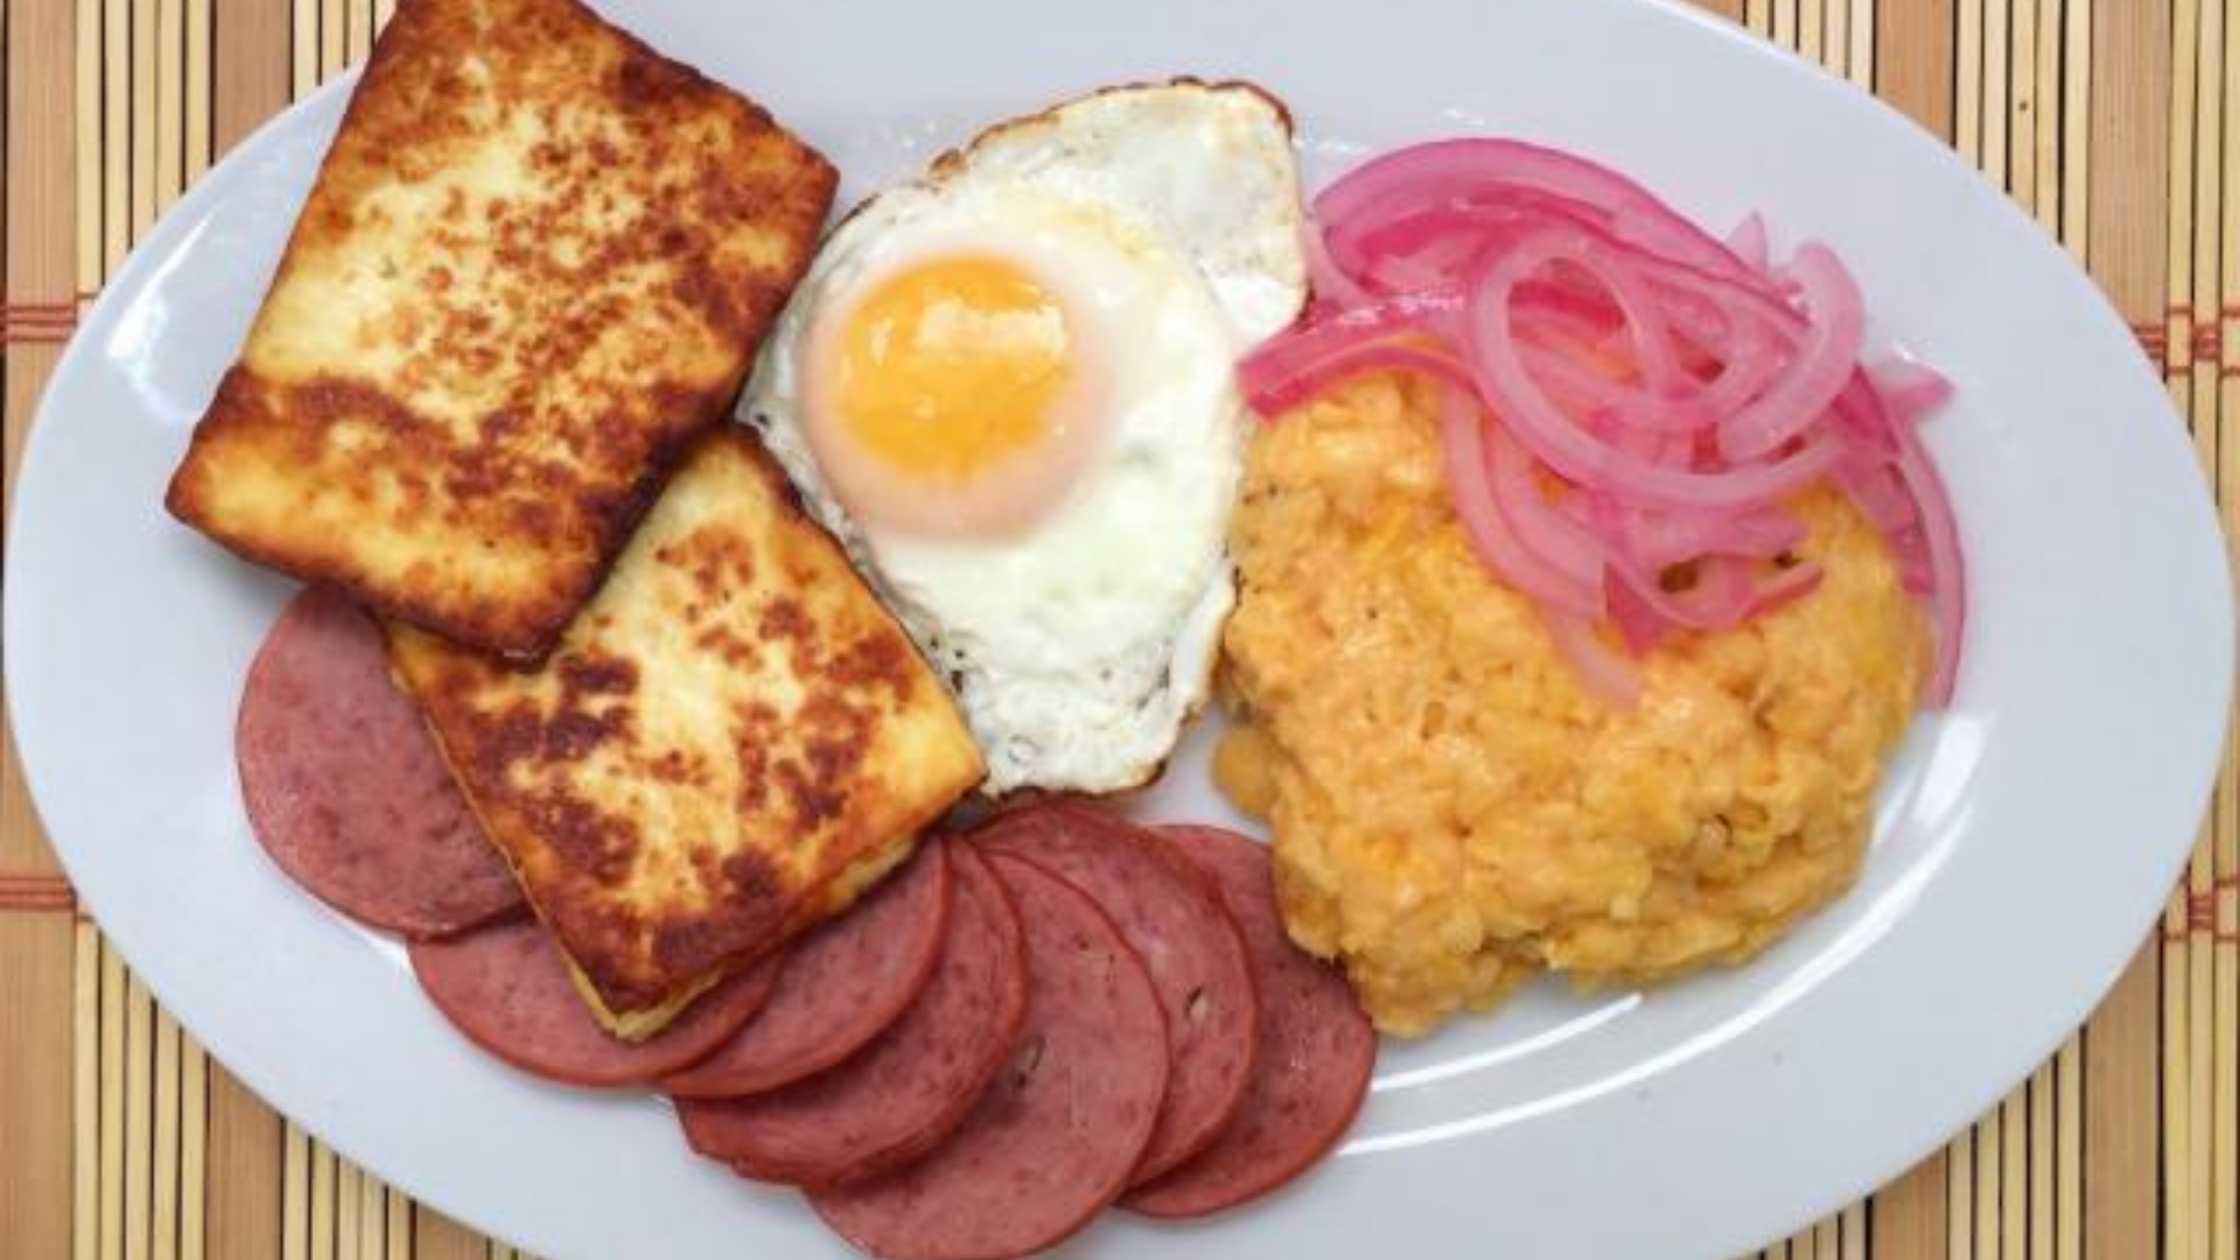 mangu dominicano on a white plate.